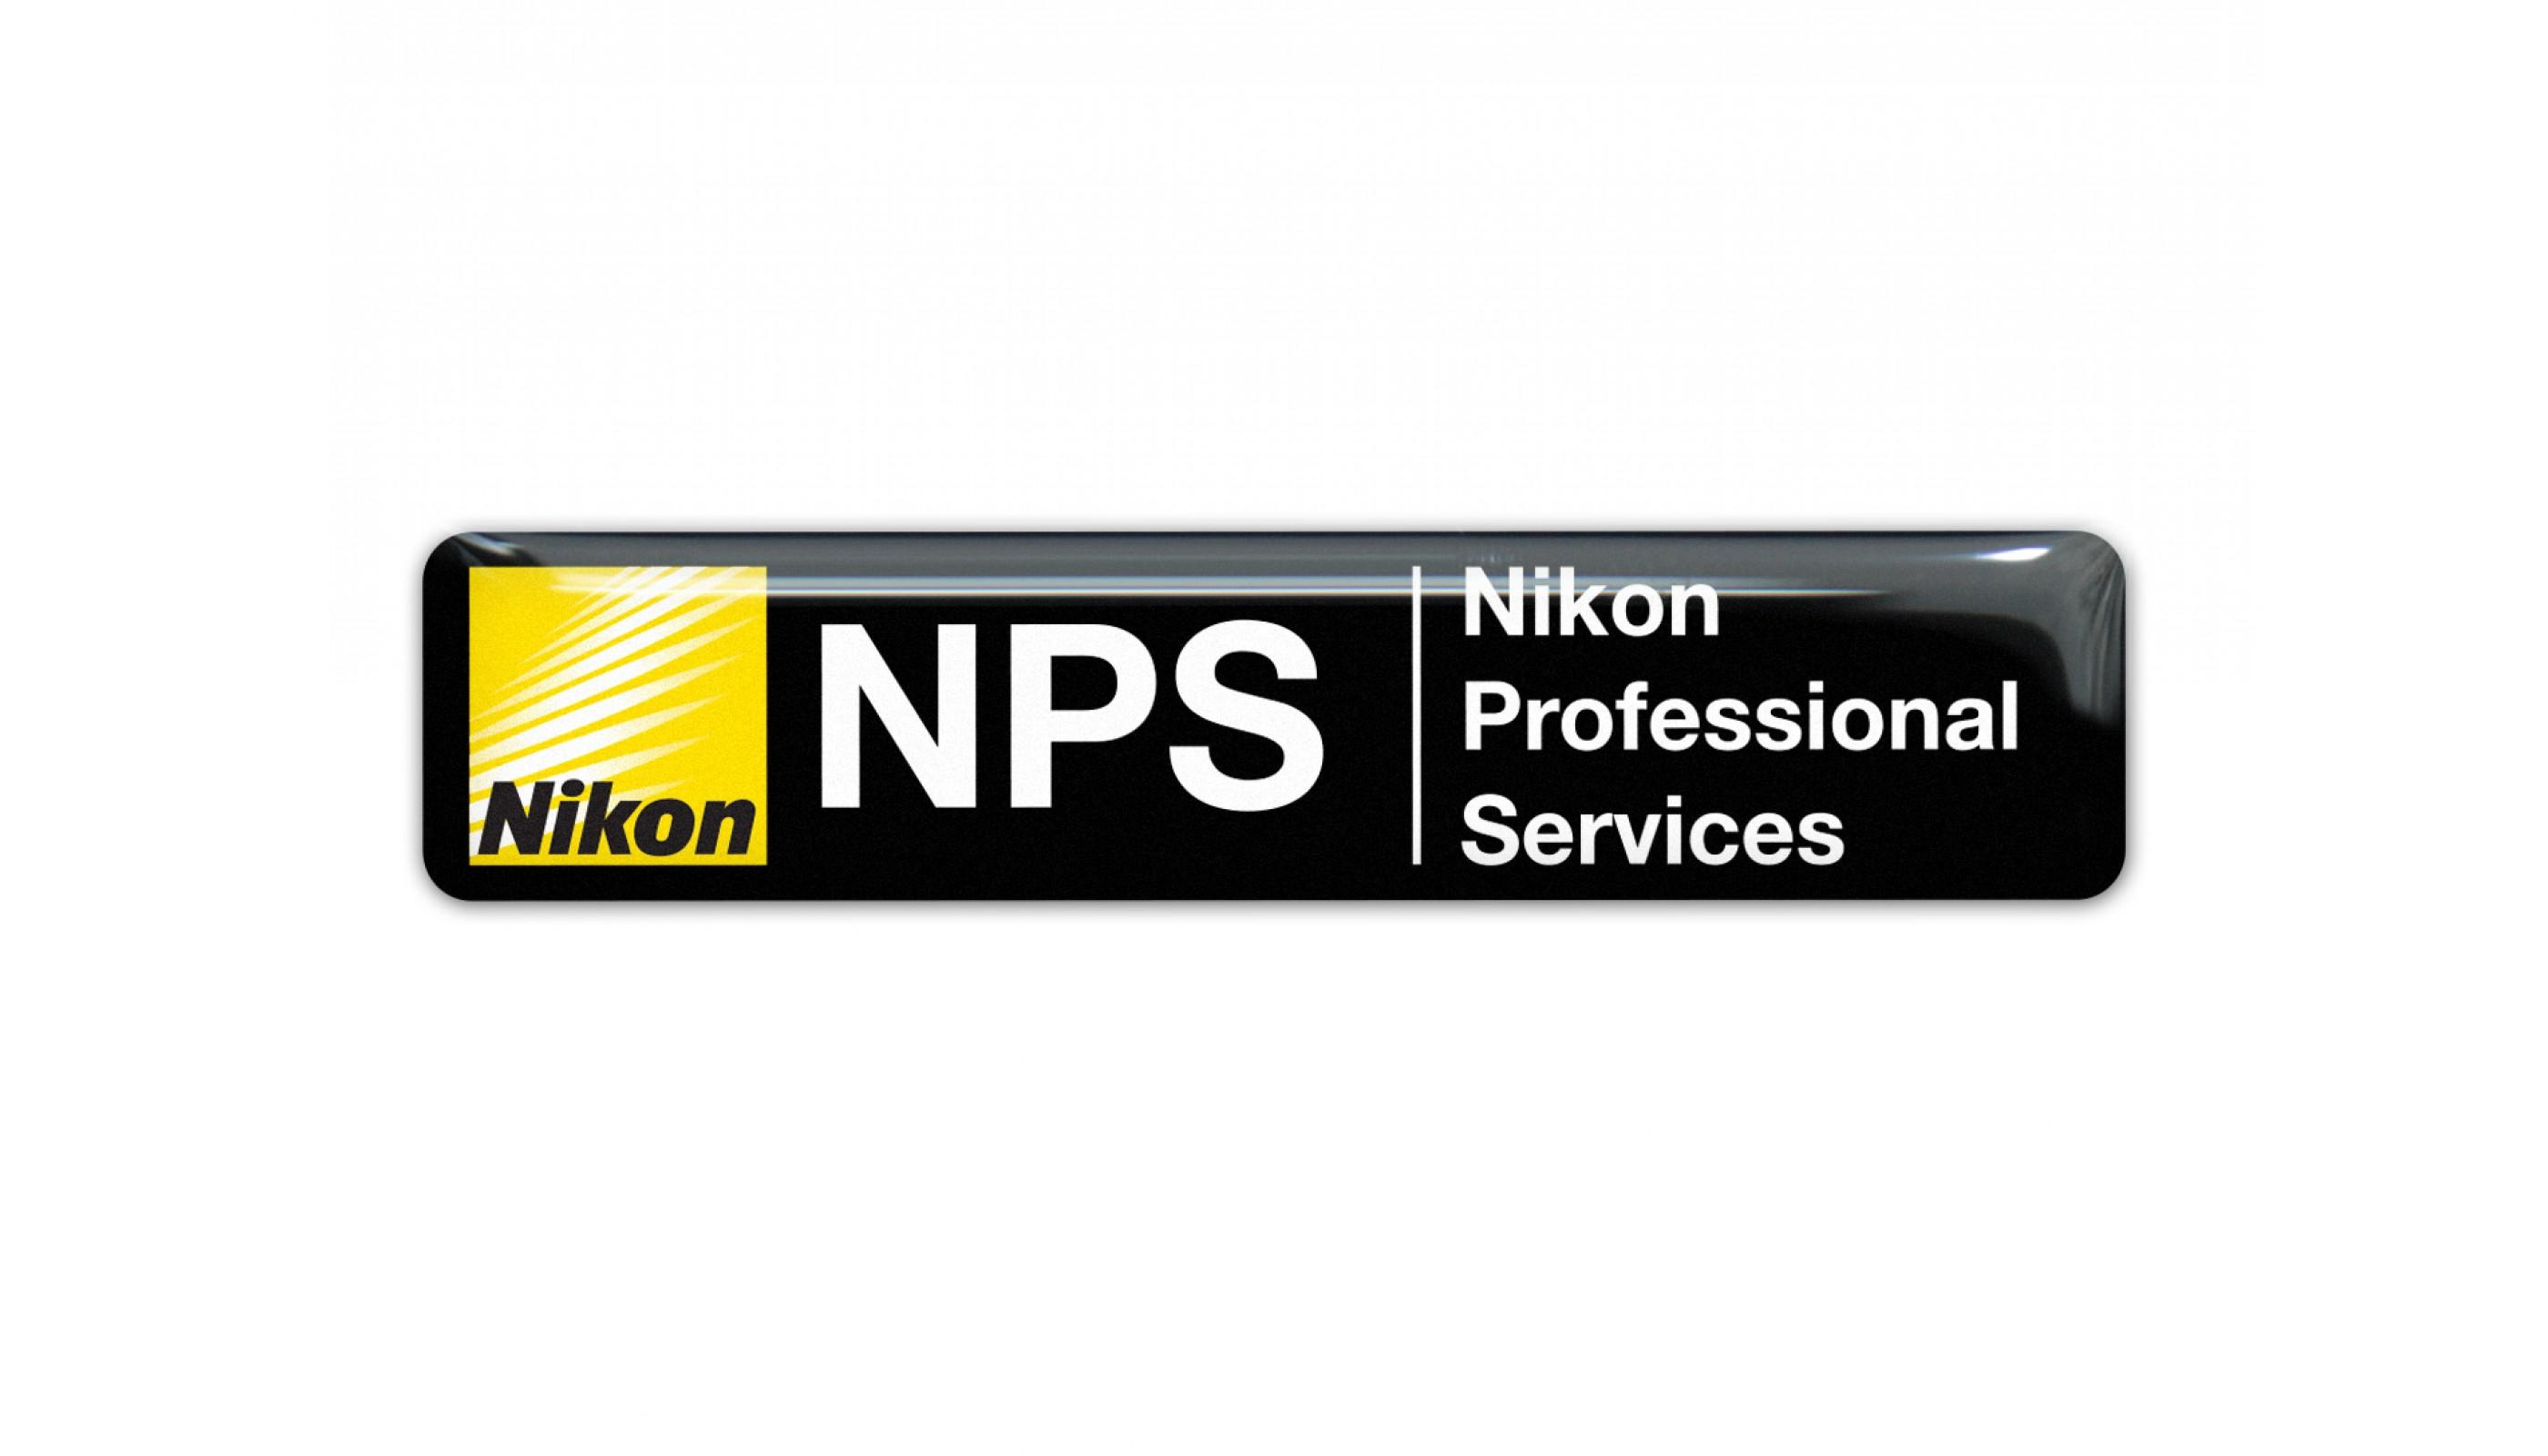 NPS - Nikon Professional Services